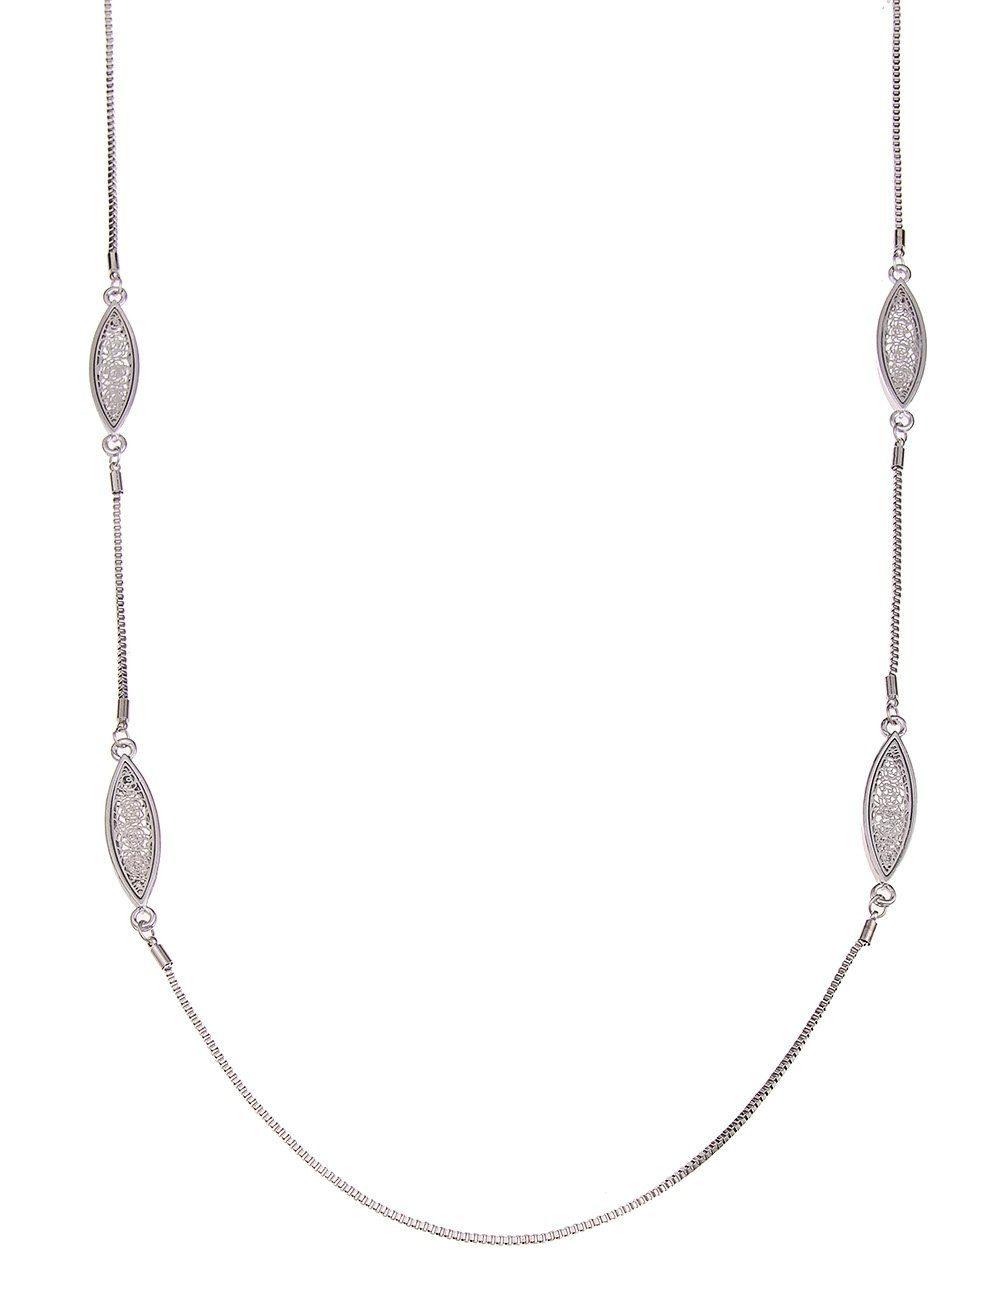 Leslii Halskette mit Rosen-Muster